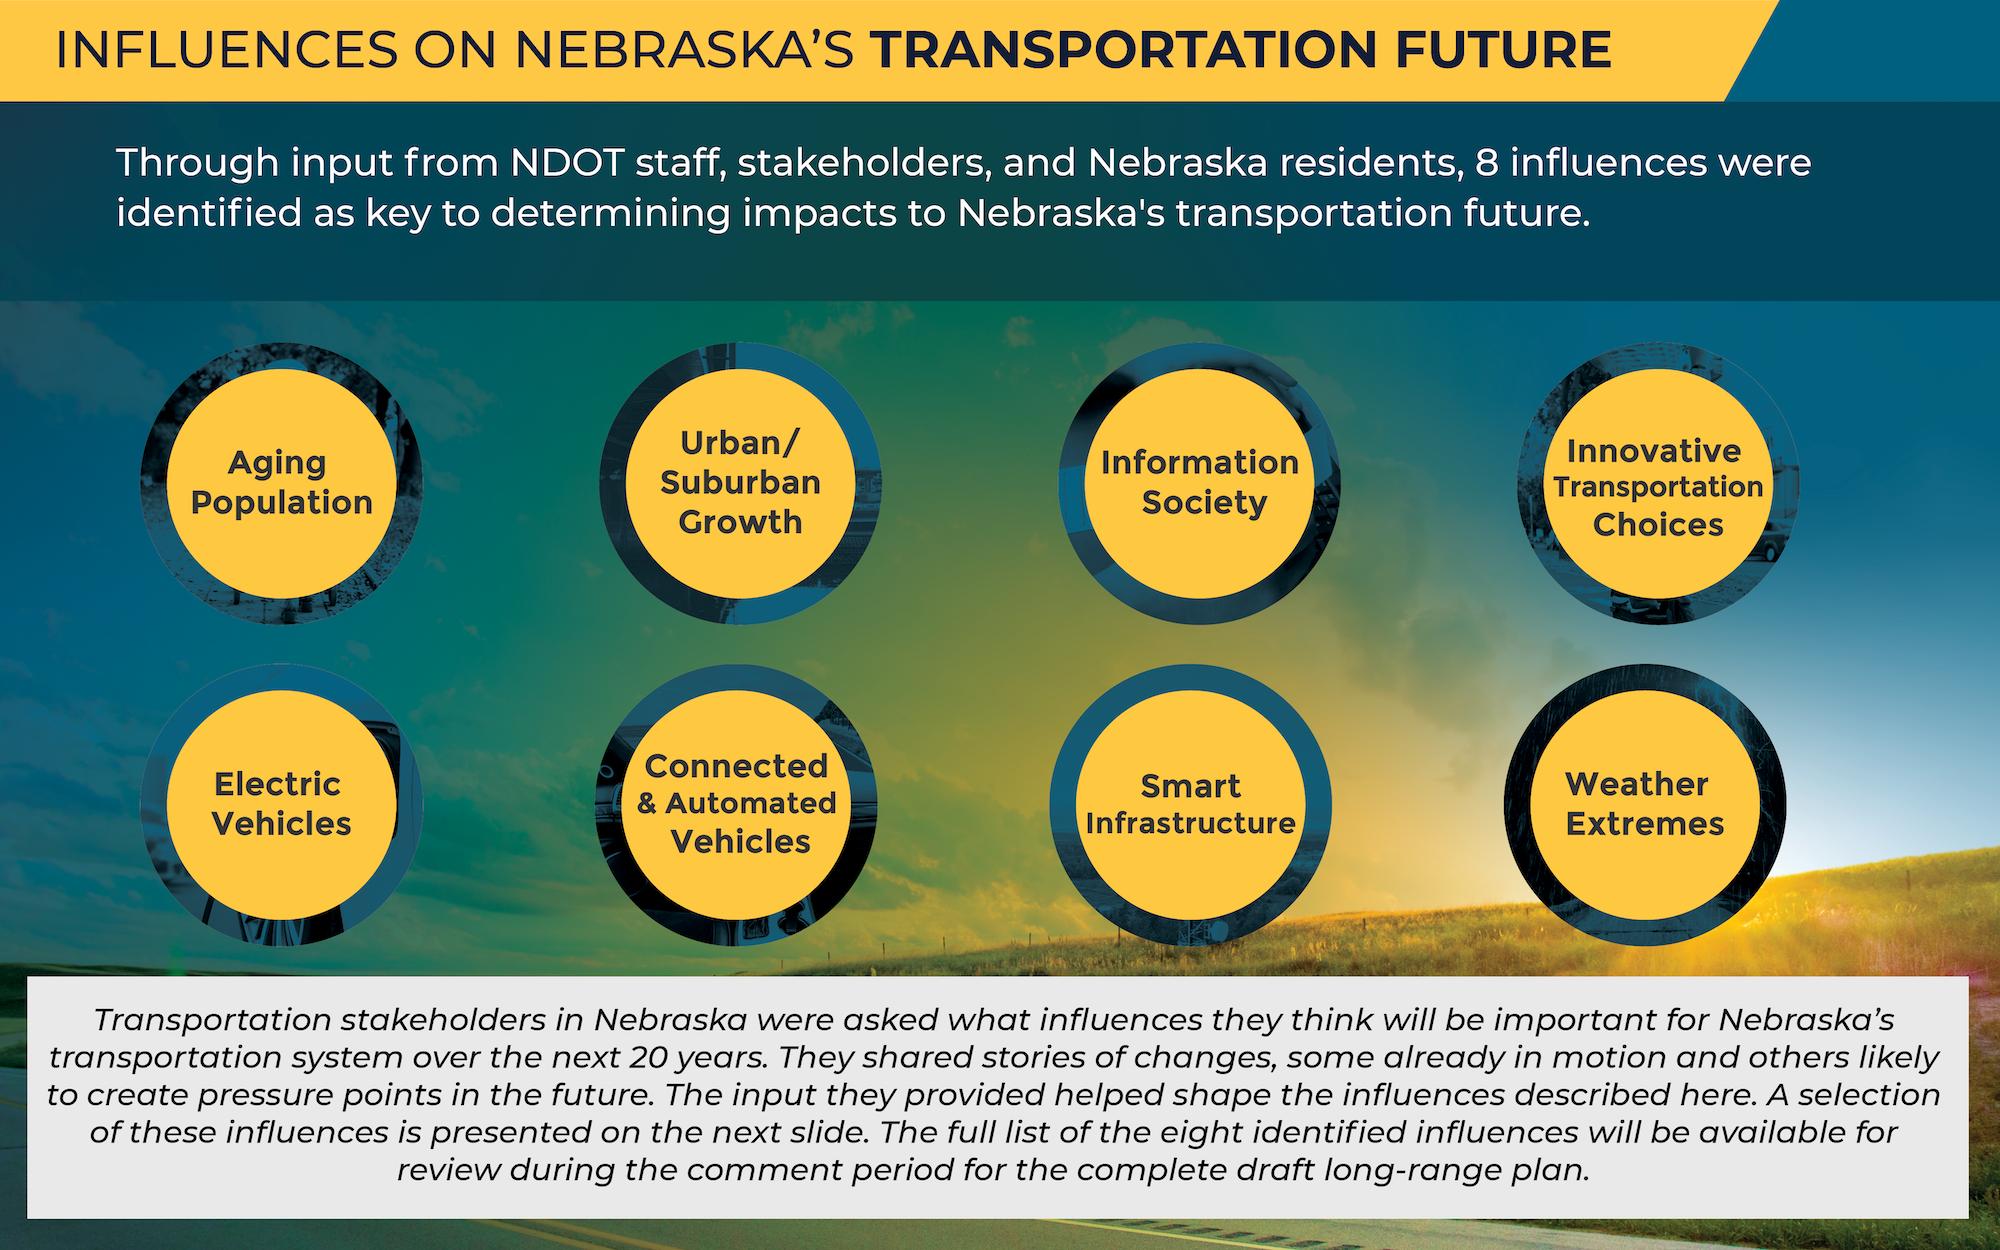 Influences on Nebraska Transportation Future